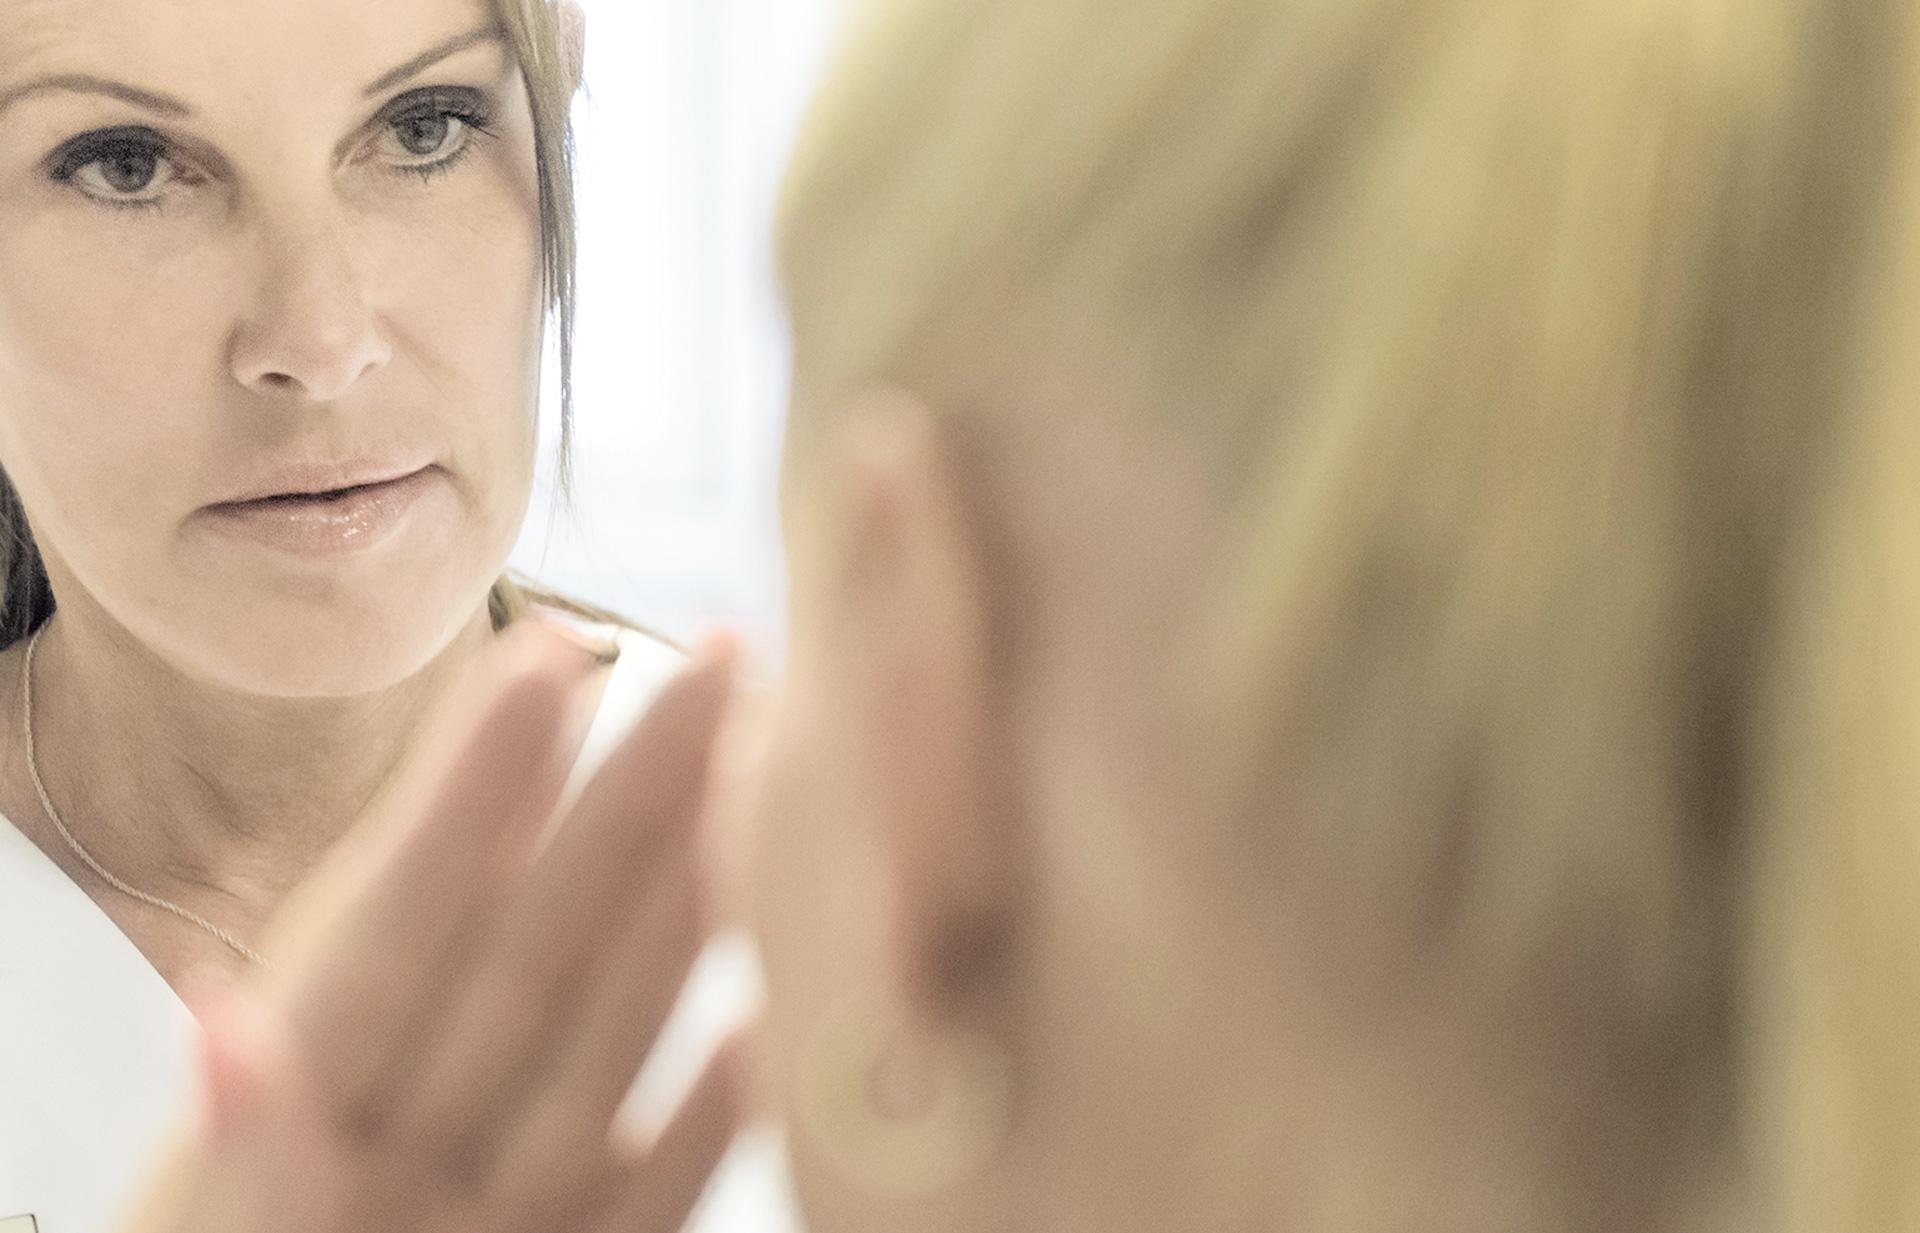 Viktige spørsmål om botox